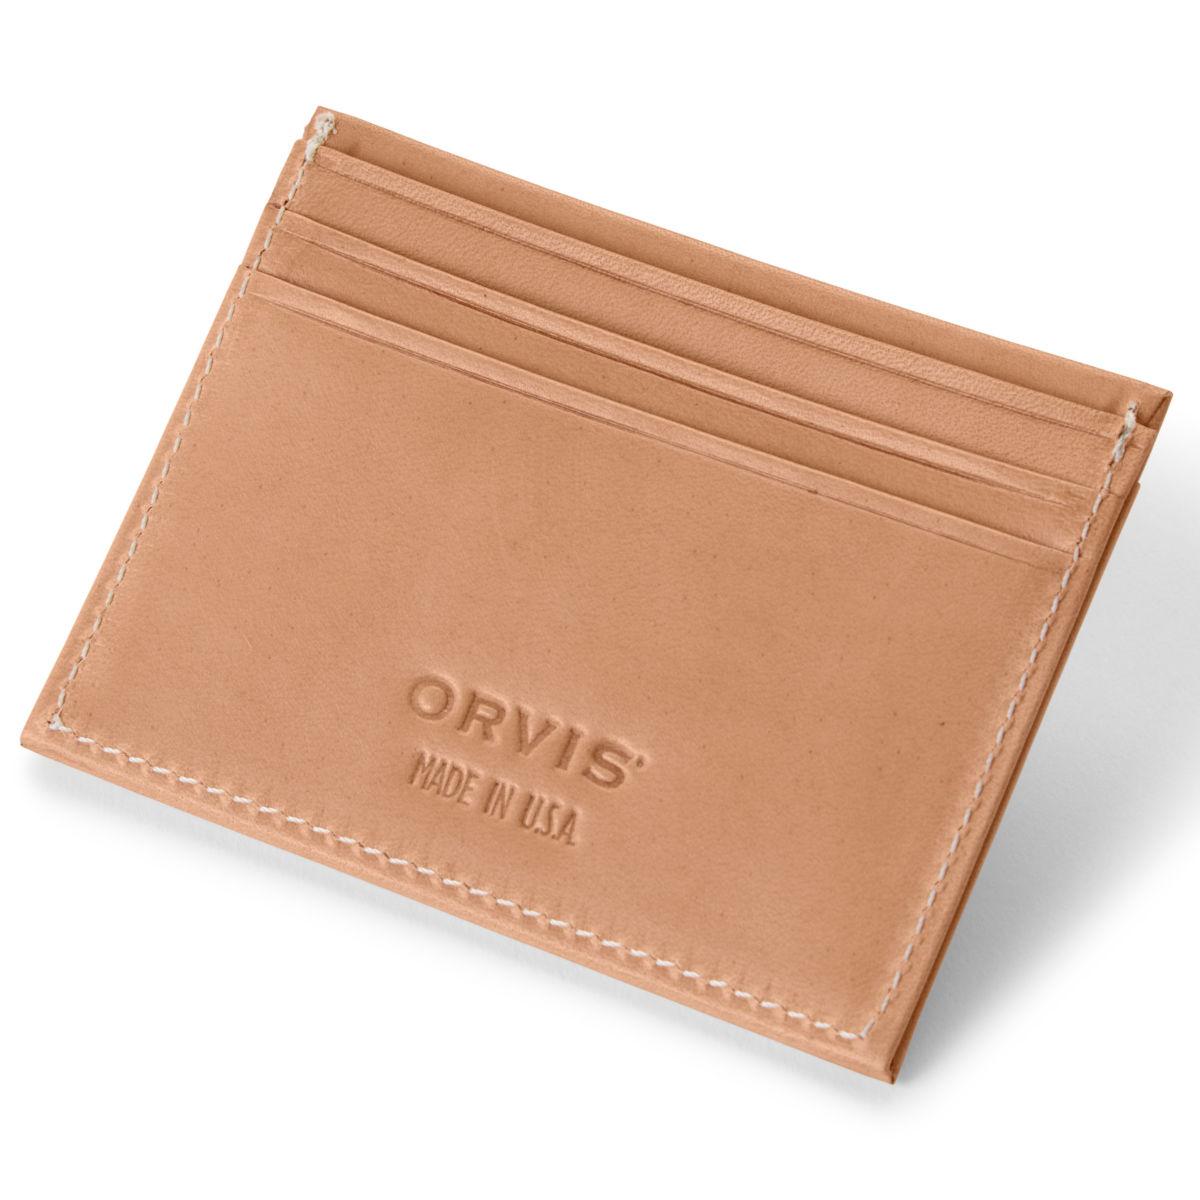 Natural Leather Card Carrier - NATURALimage number 0